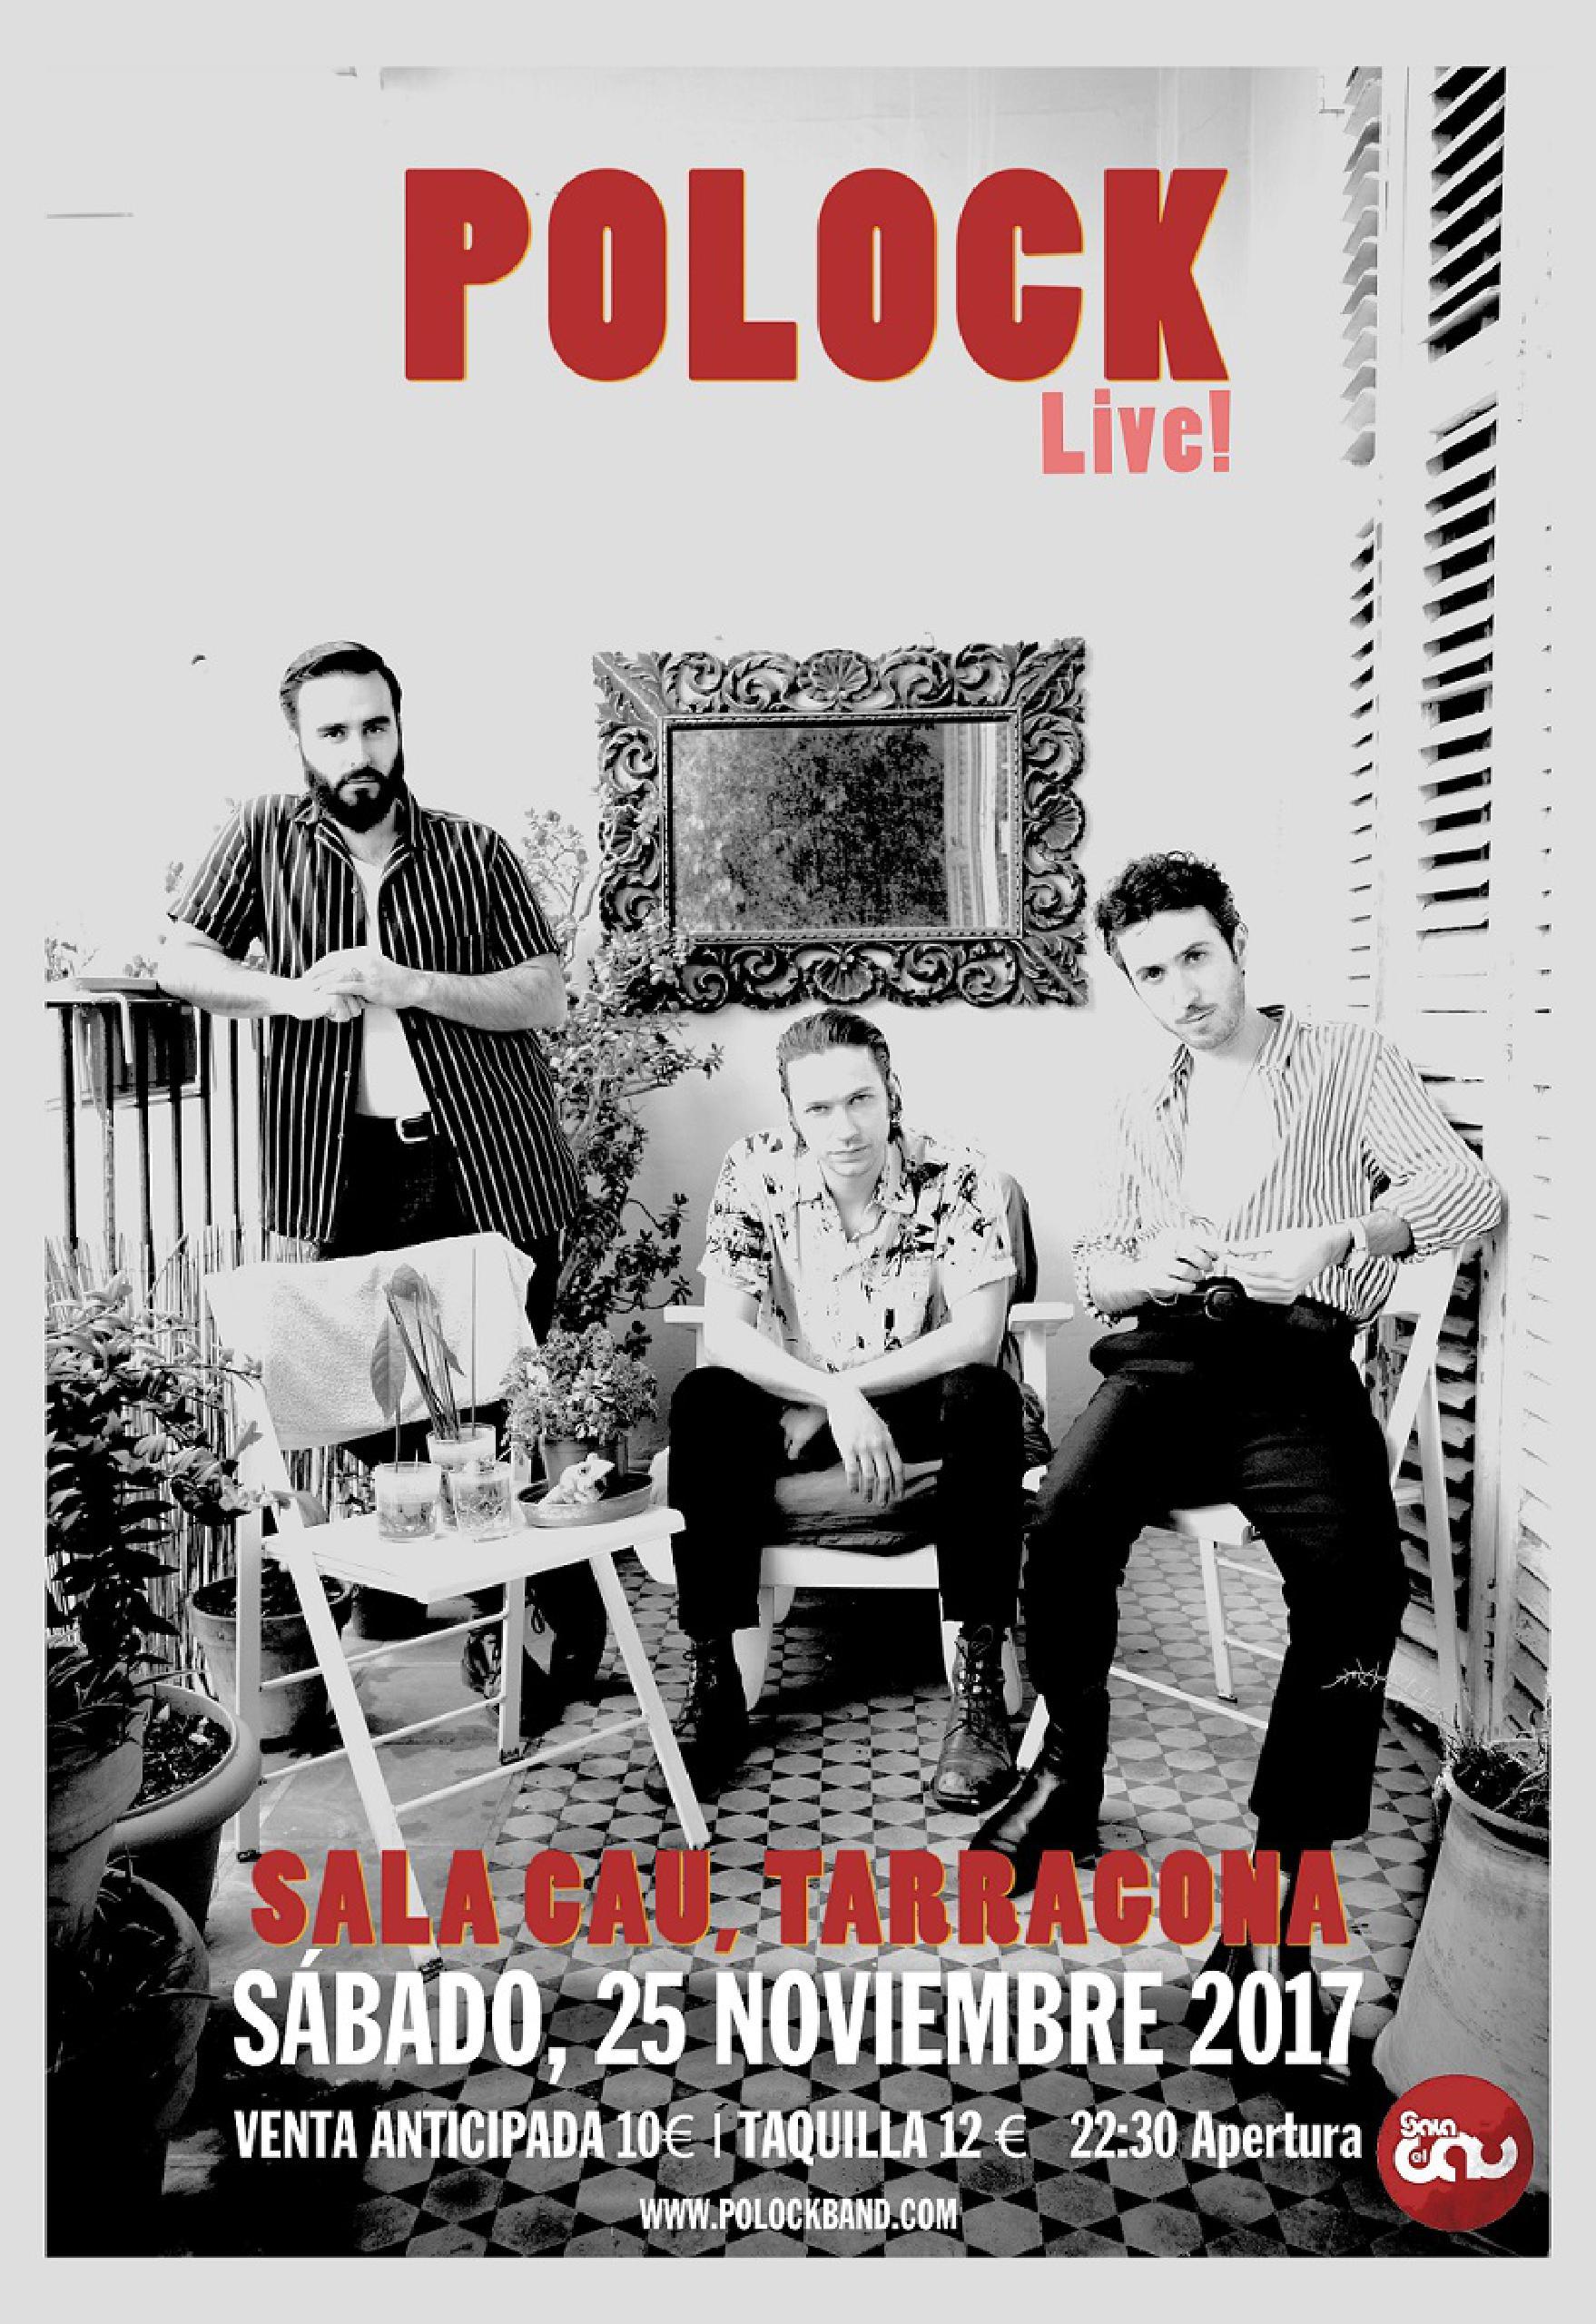 Polock Tarragona